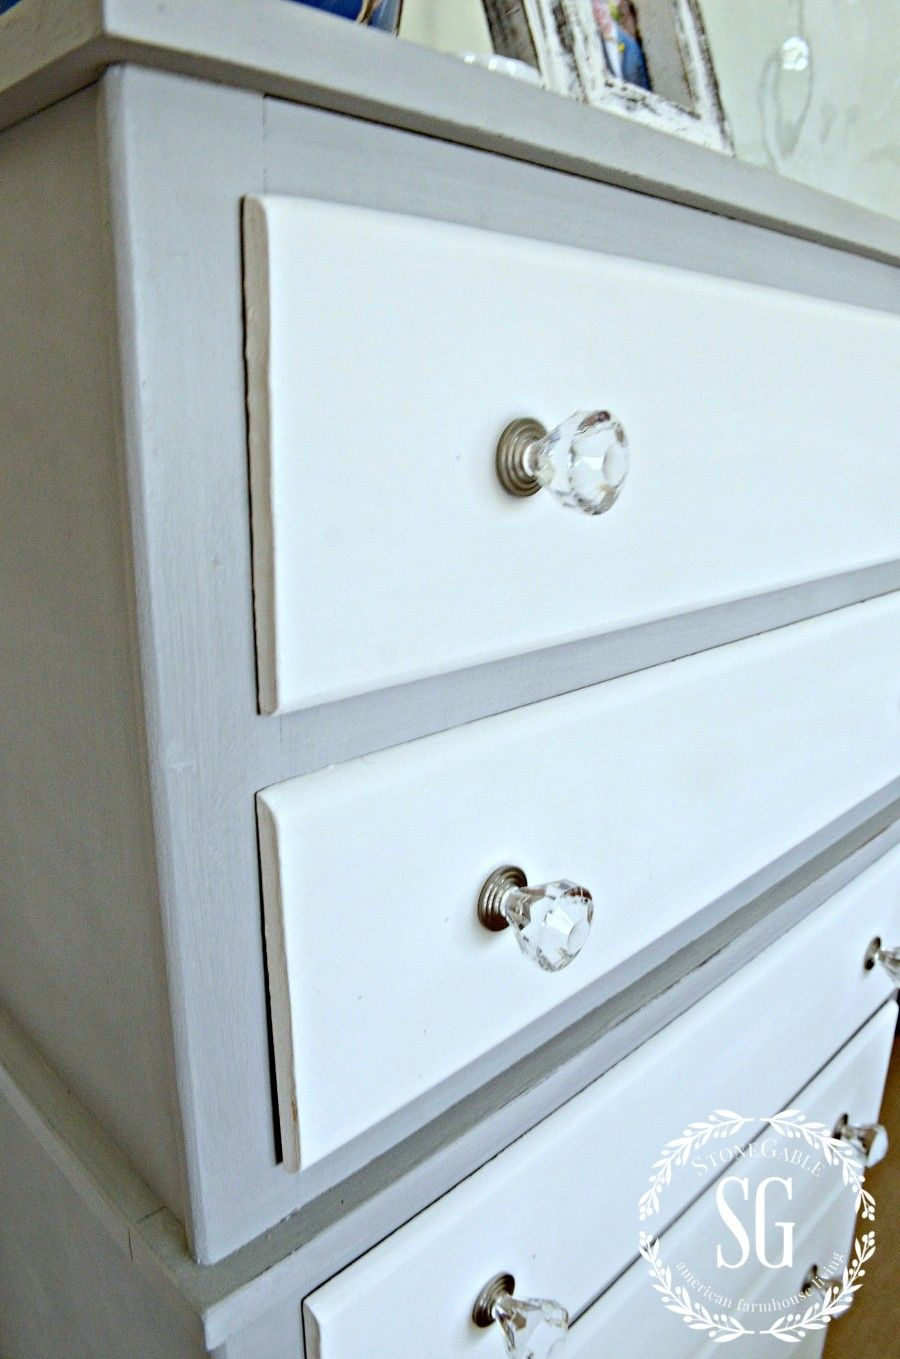 Two Toned Paris Grey And White Dresser Diy Stonegable Diy Dresser White Dresser Diy Dresser Remodel [ 1359 x 900 Pixel ]